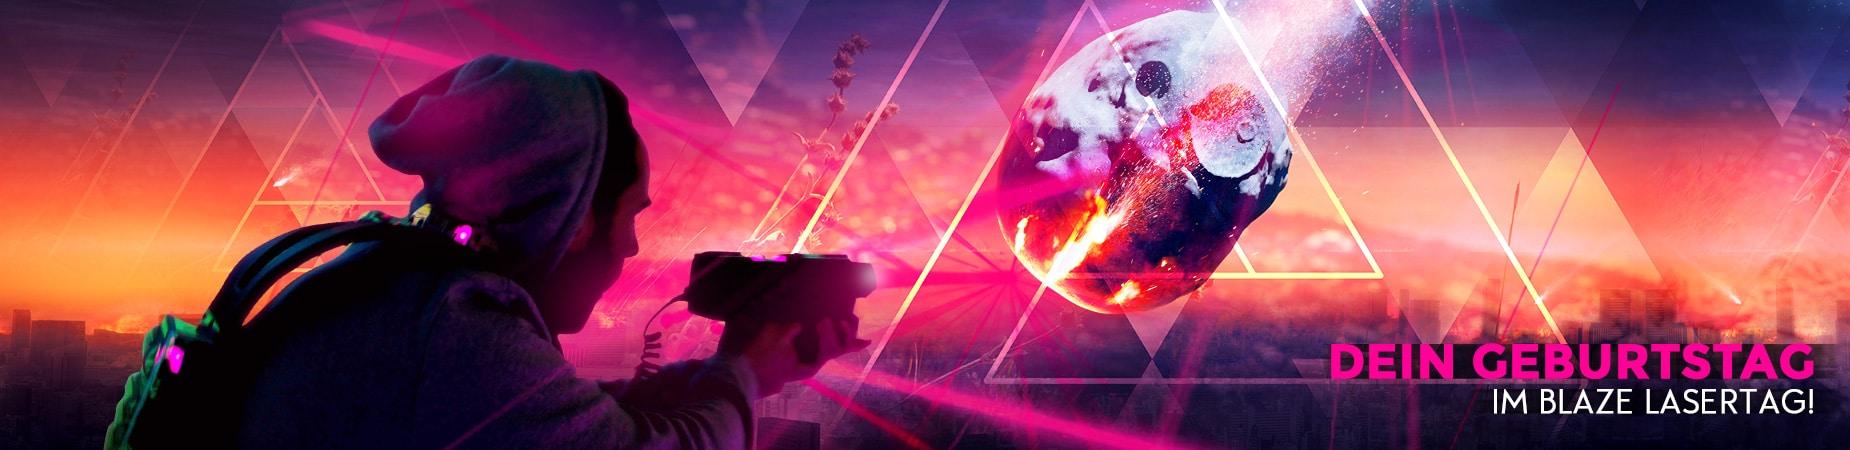 lasertag geburtstag